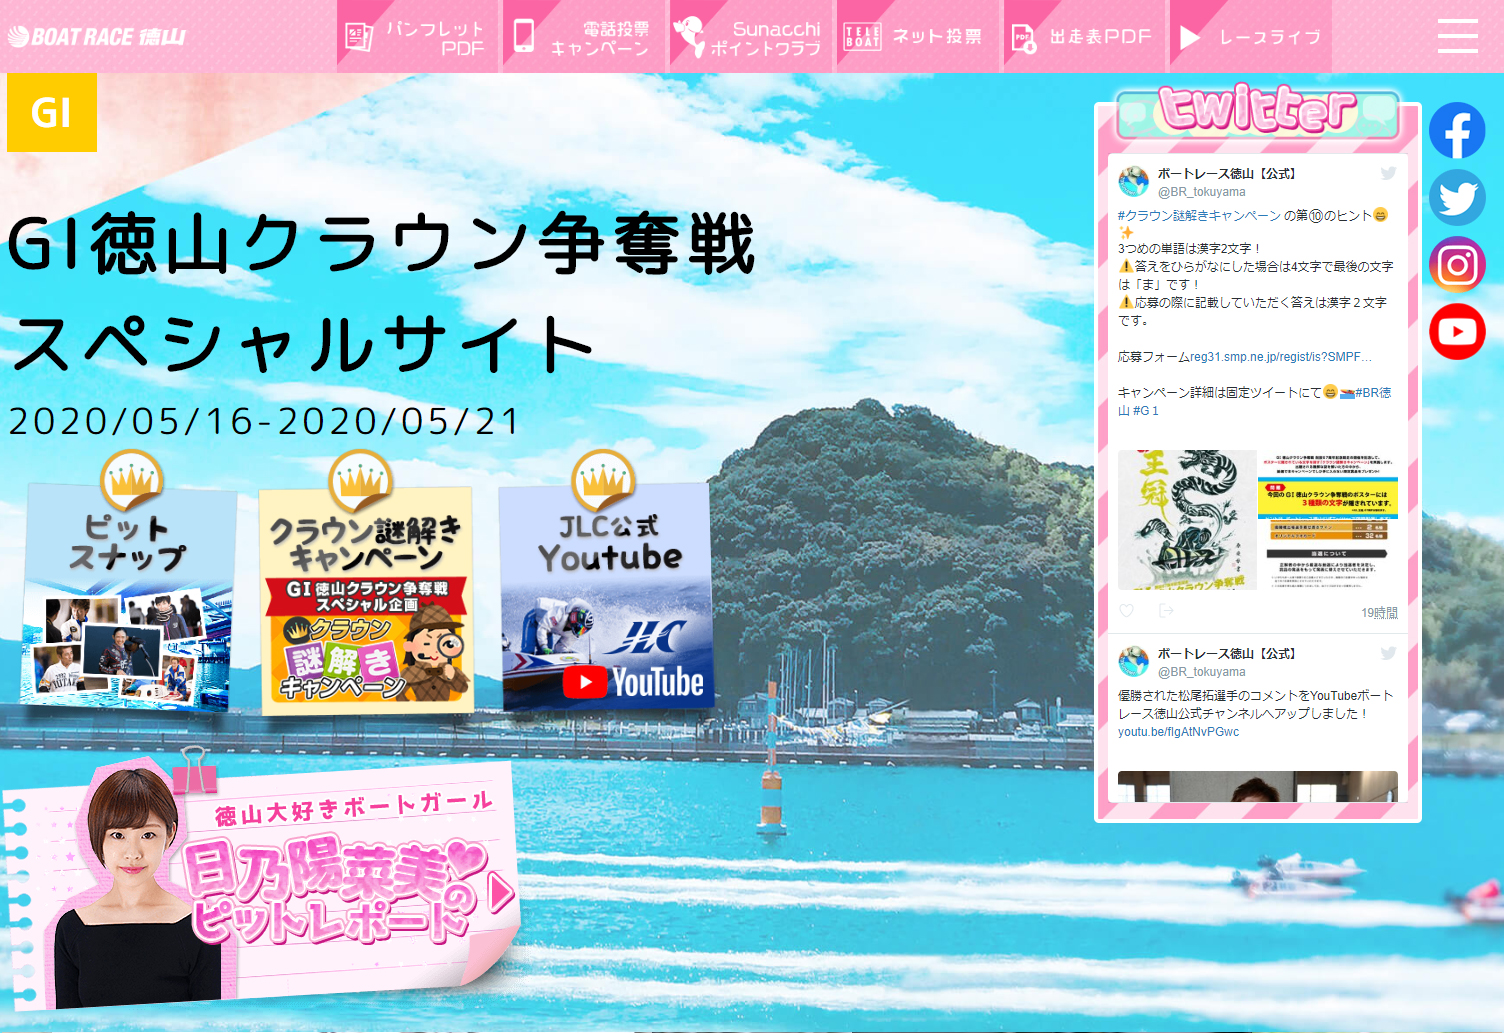 G1徳山周年 徳山クラウン争奪戦の特設サイト ボートレース徳山・競艇